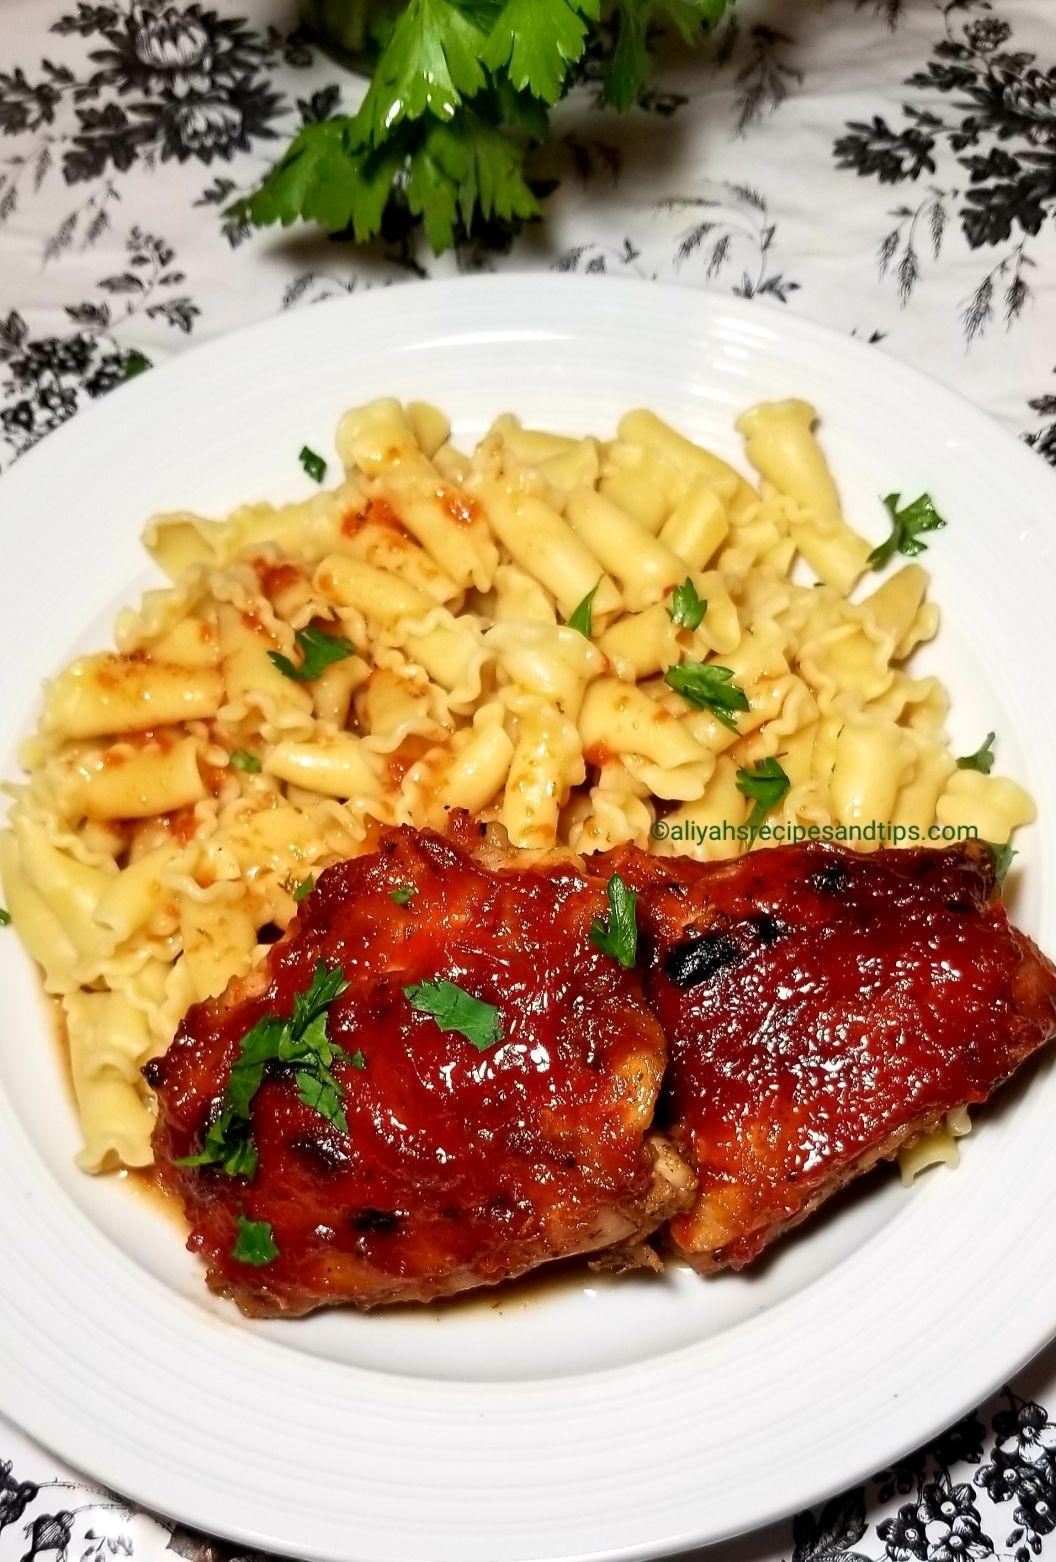 sticky baked chicken thighs, garlic chicken wings, teriyaki, chicken drumsticks, recipetin eats, honey soy sauce, teriyaki chicken, boneless chicken, glazed chicken, fried chicken, boneless chicken, bbq chicken, chinese, sticky baked chicken thighs, sticky baked chicken, sticky chicken, spicy, sweet and sticky chicken thighs, caramelized baked chicken recipe, sweet and sticky chicken recipe